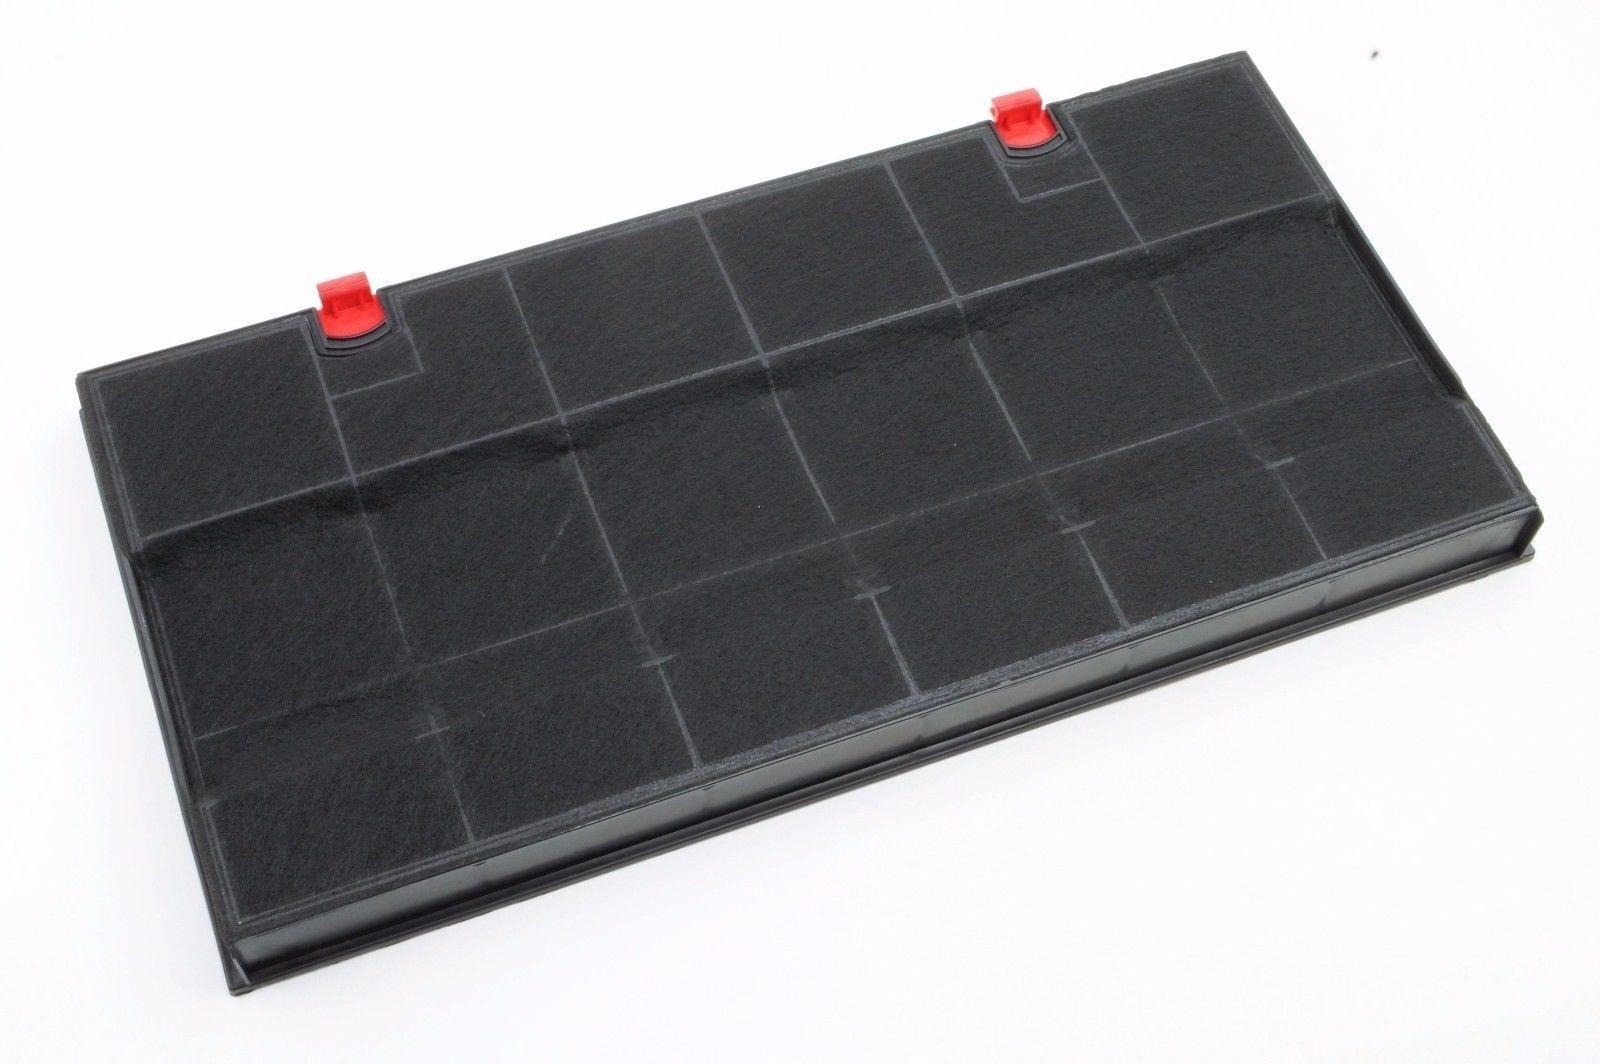 aeg juno aktiv kohle filter elica typ 150 f r dunstabzugshaube. Black Bedroom Furniture Sets. Home Design Ideas